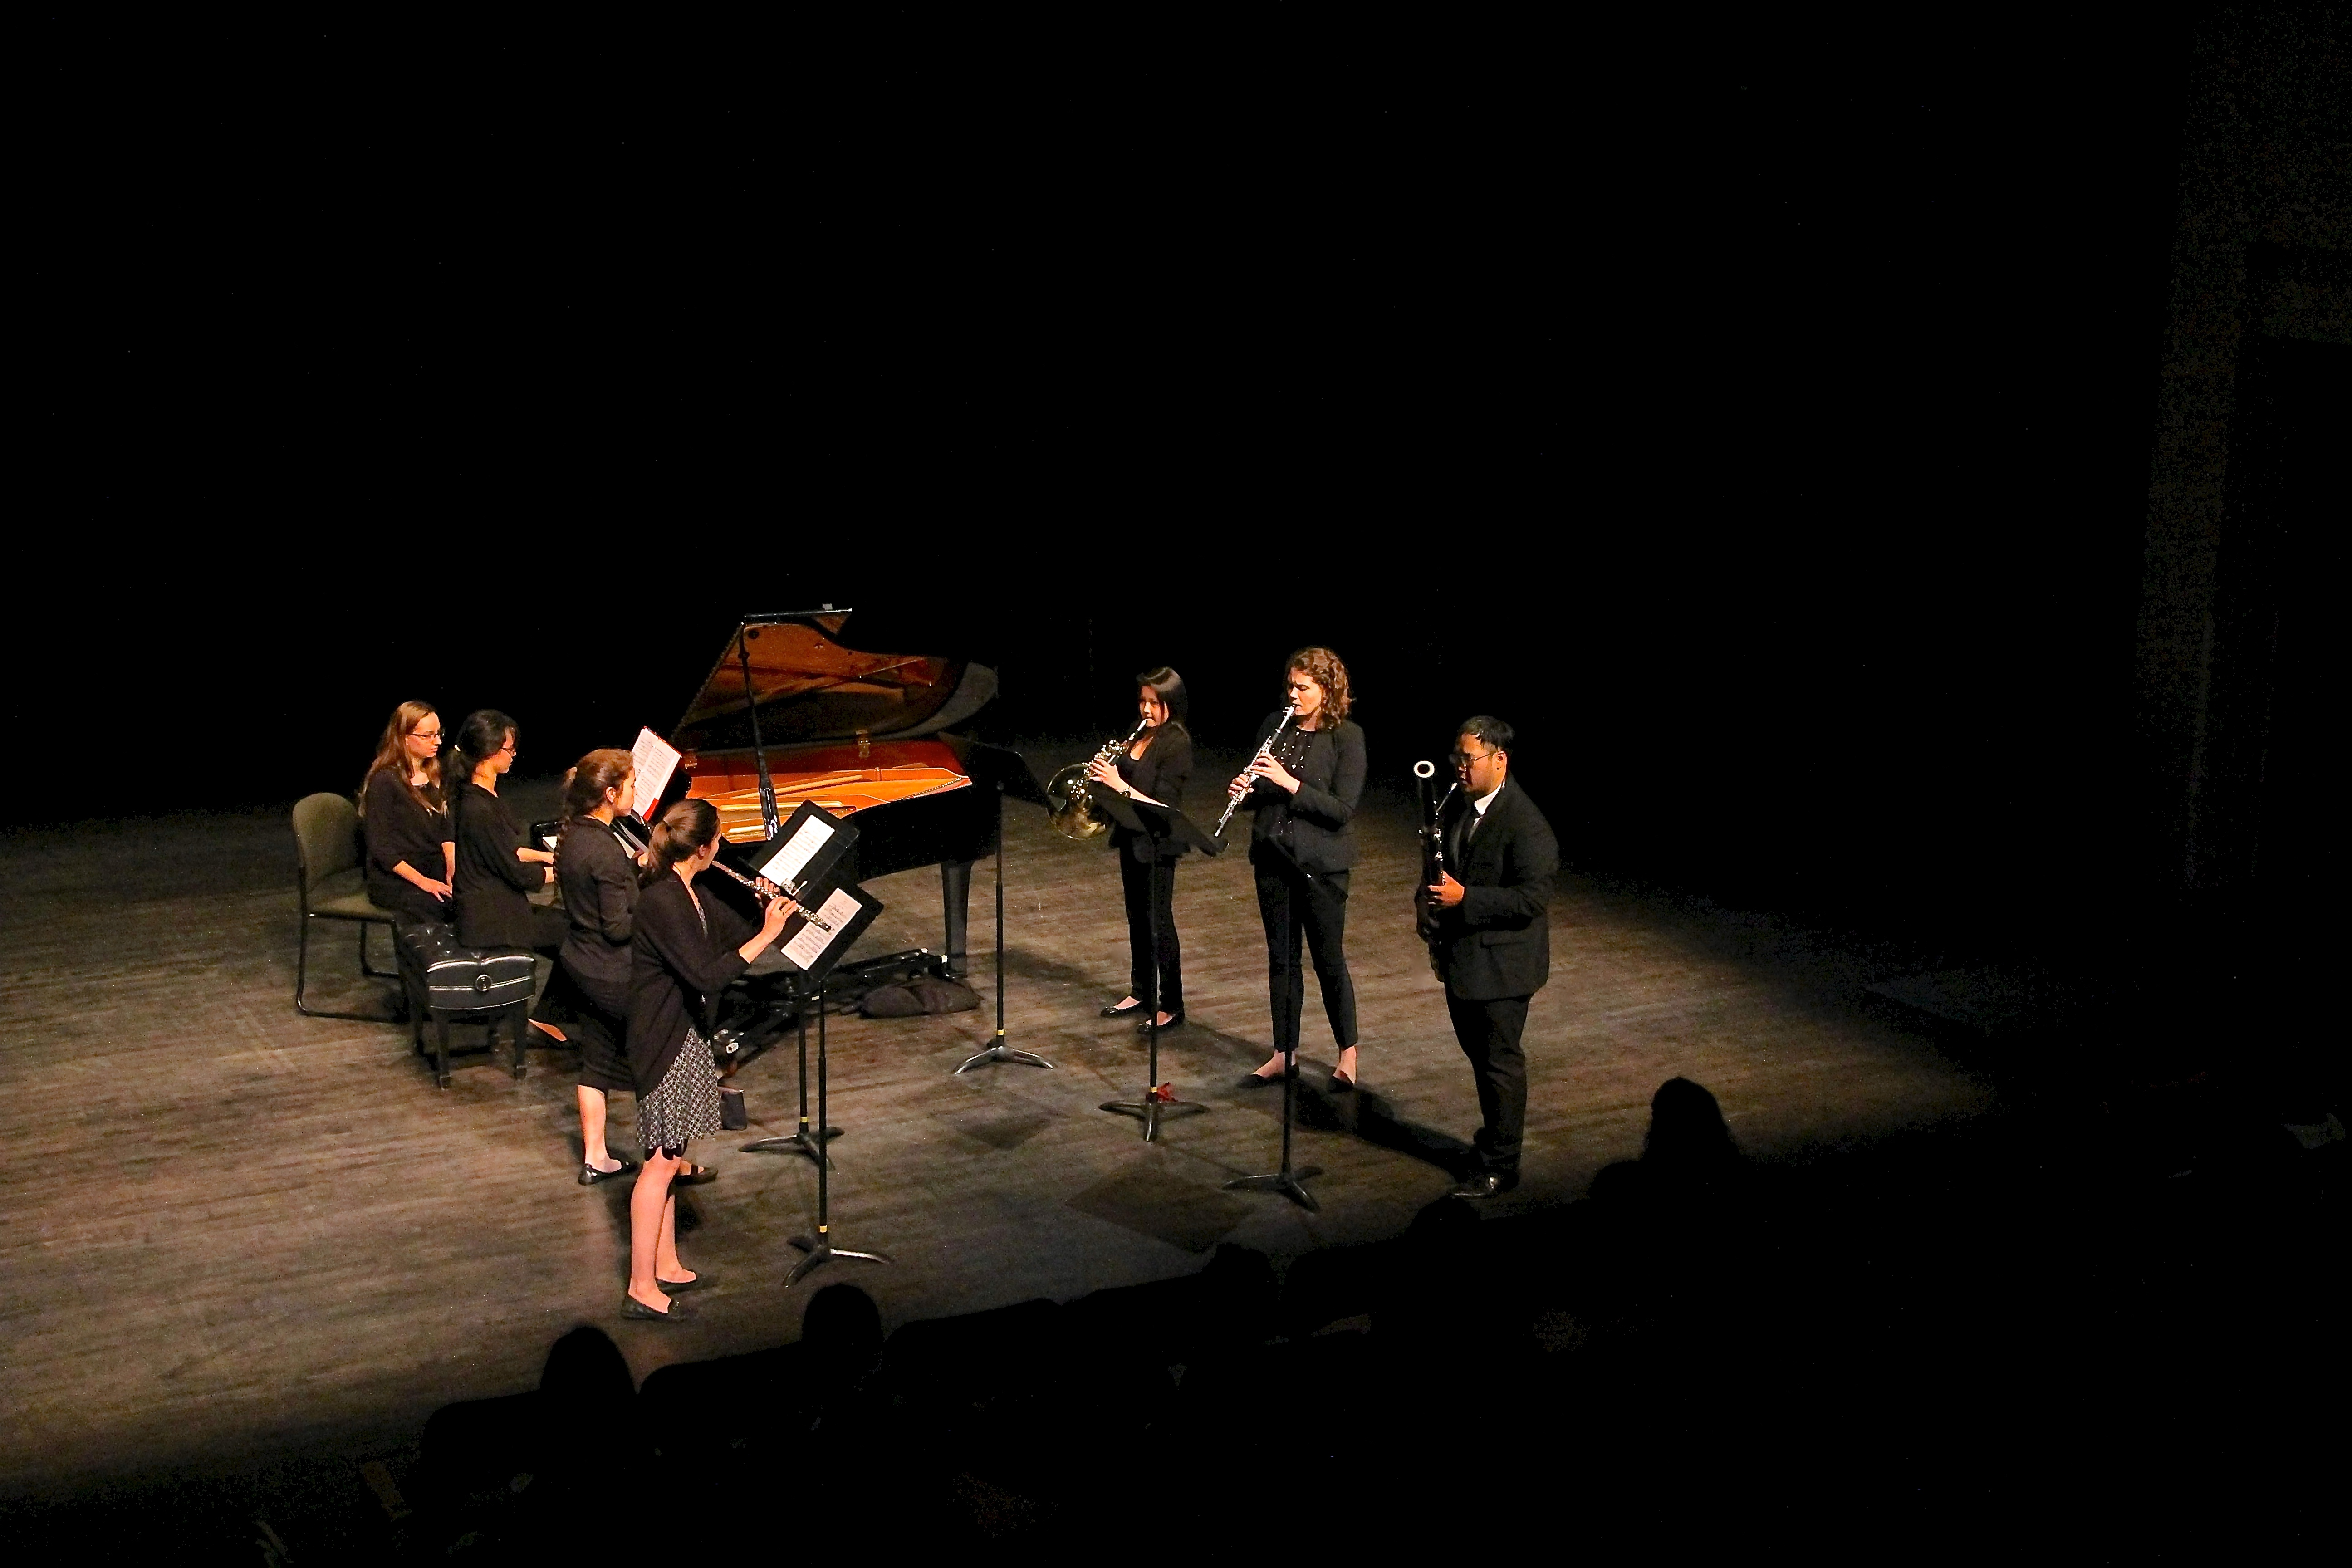 VSOIW 2017 | Poulenc Sextet